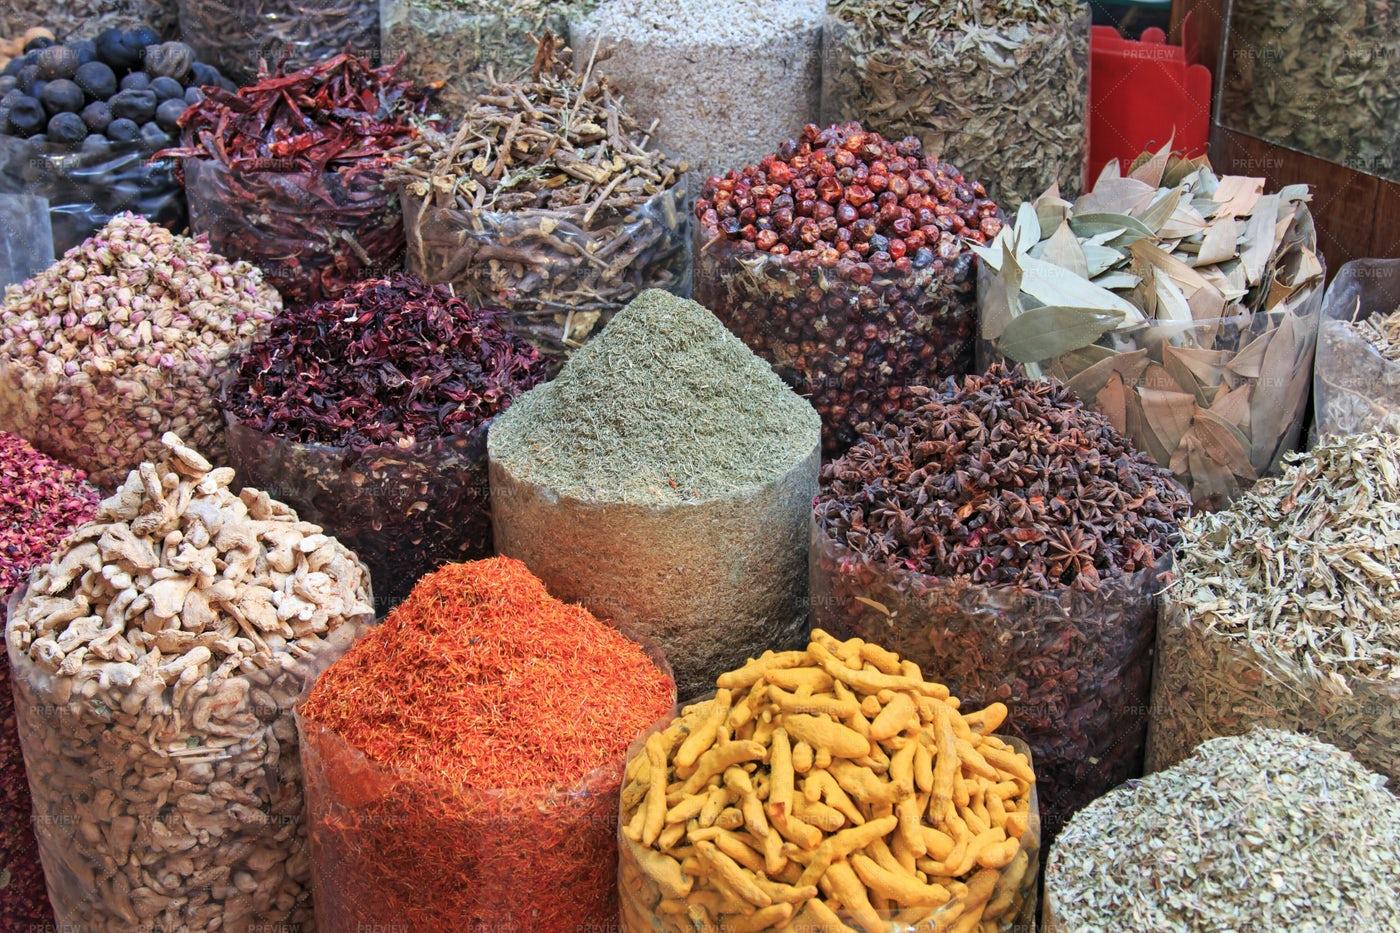 Spices In Sacks: Stock Photos